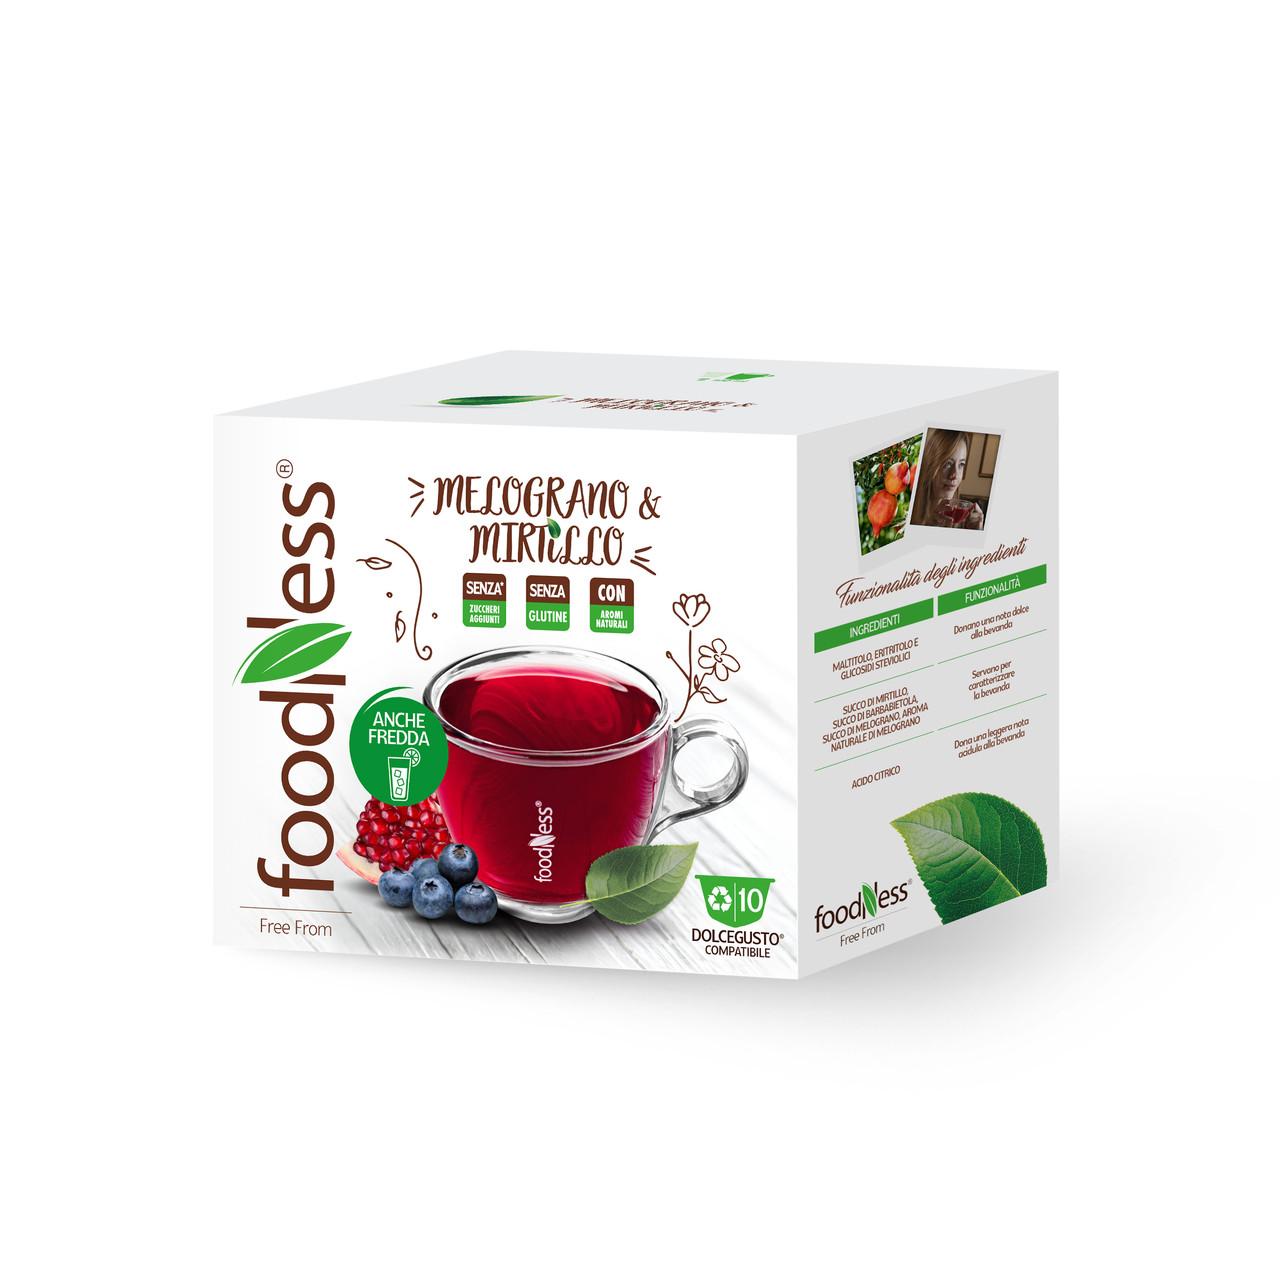 Чай в капсулах FoodNess Dolce Gusto Pomegranate & Blueberry 10 шт. (Фуднес Дольче Густо), Италия